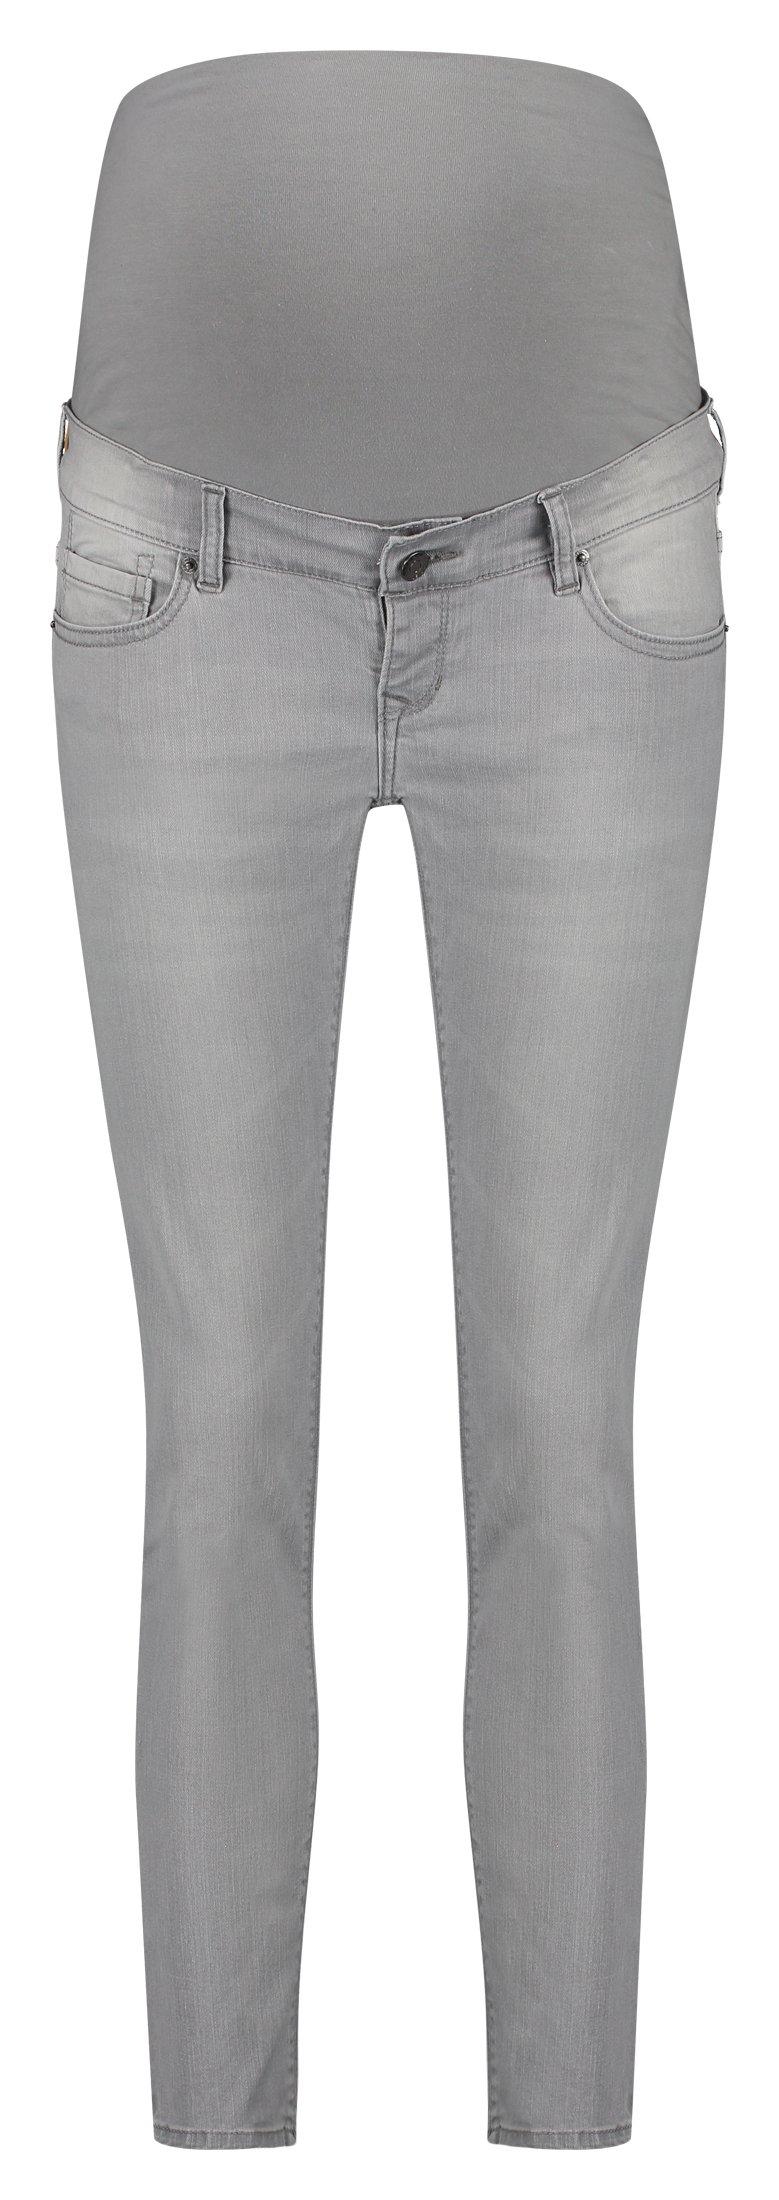 Noppies slim jeans »Mila Light Aged grey« - gratis ruilen op otto.nl